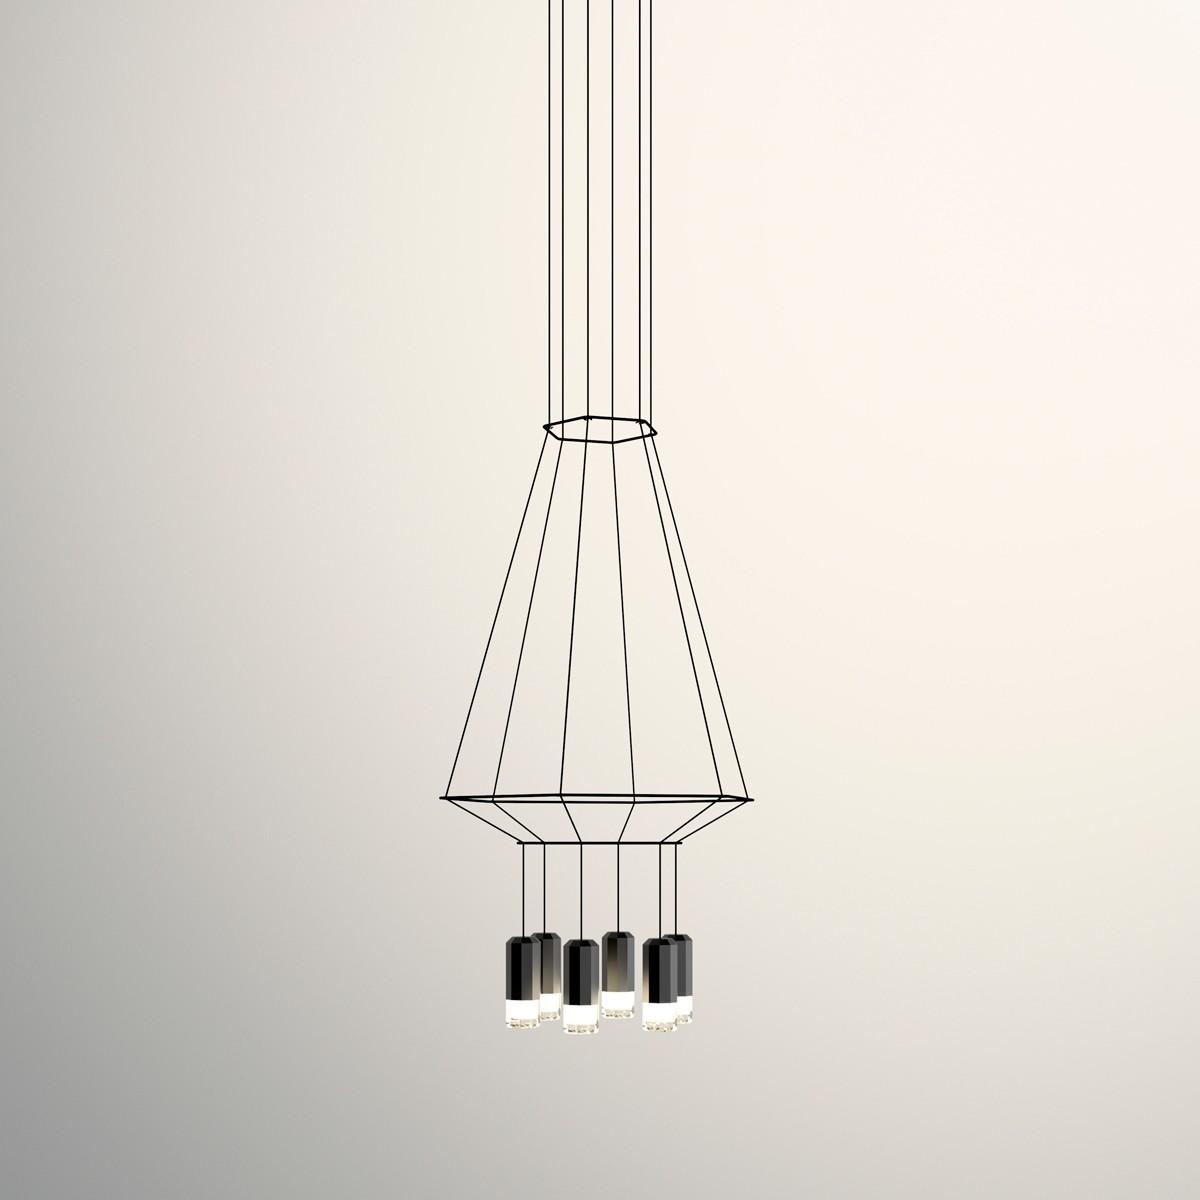 Vibia Wireflow Pendelleuchte, 6-flg., 110 x 127 cm, schwarz